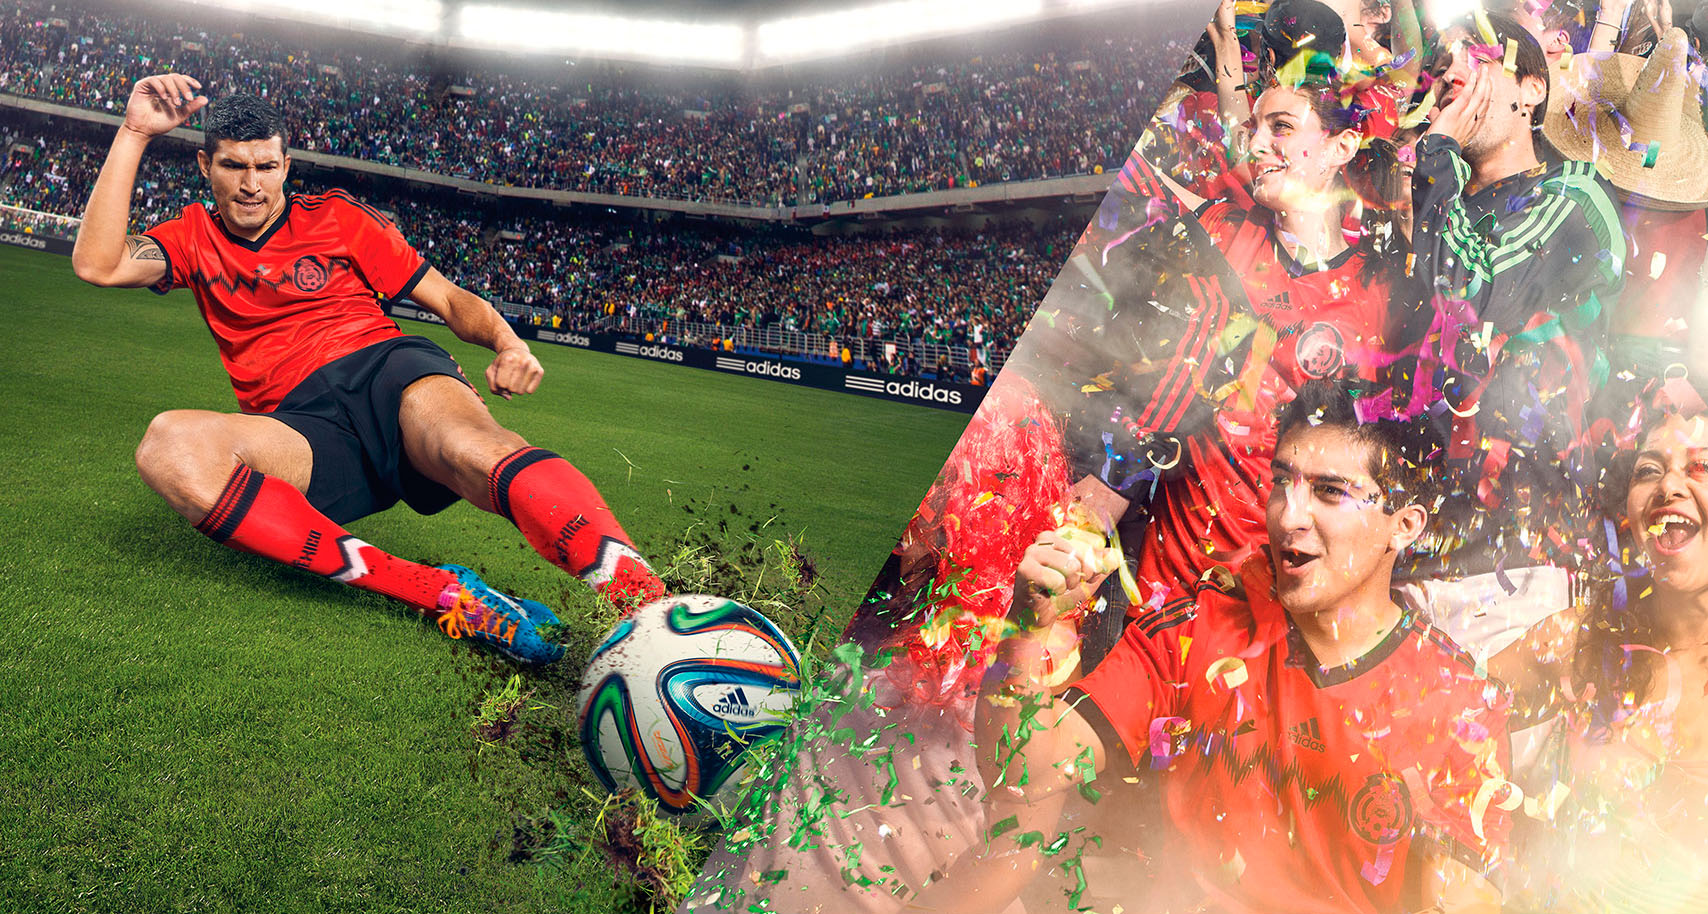 Mexican Soccer Team 1 adidas barrida team mexico 1708x914